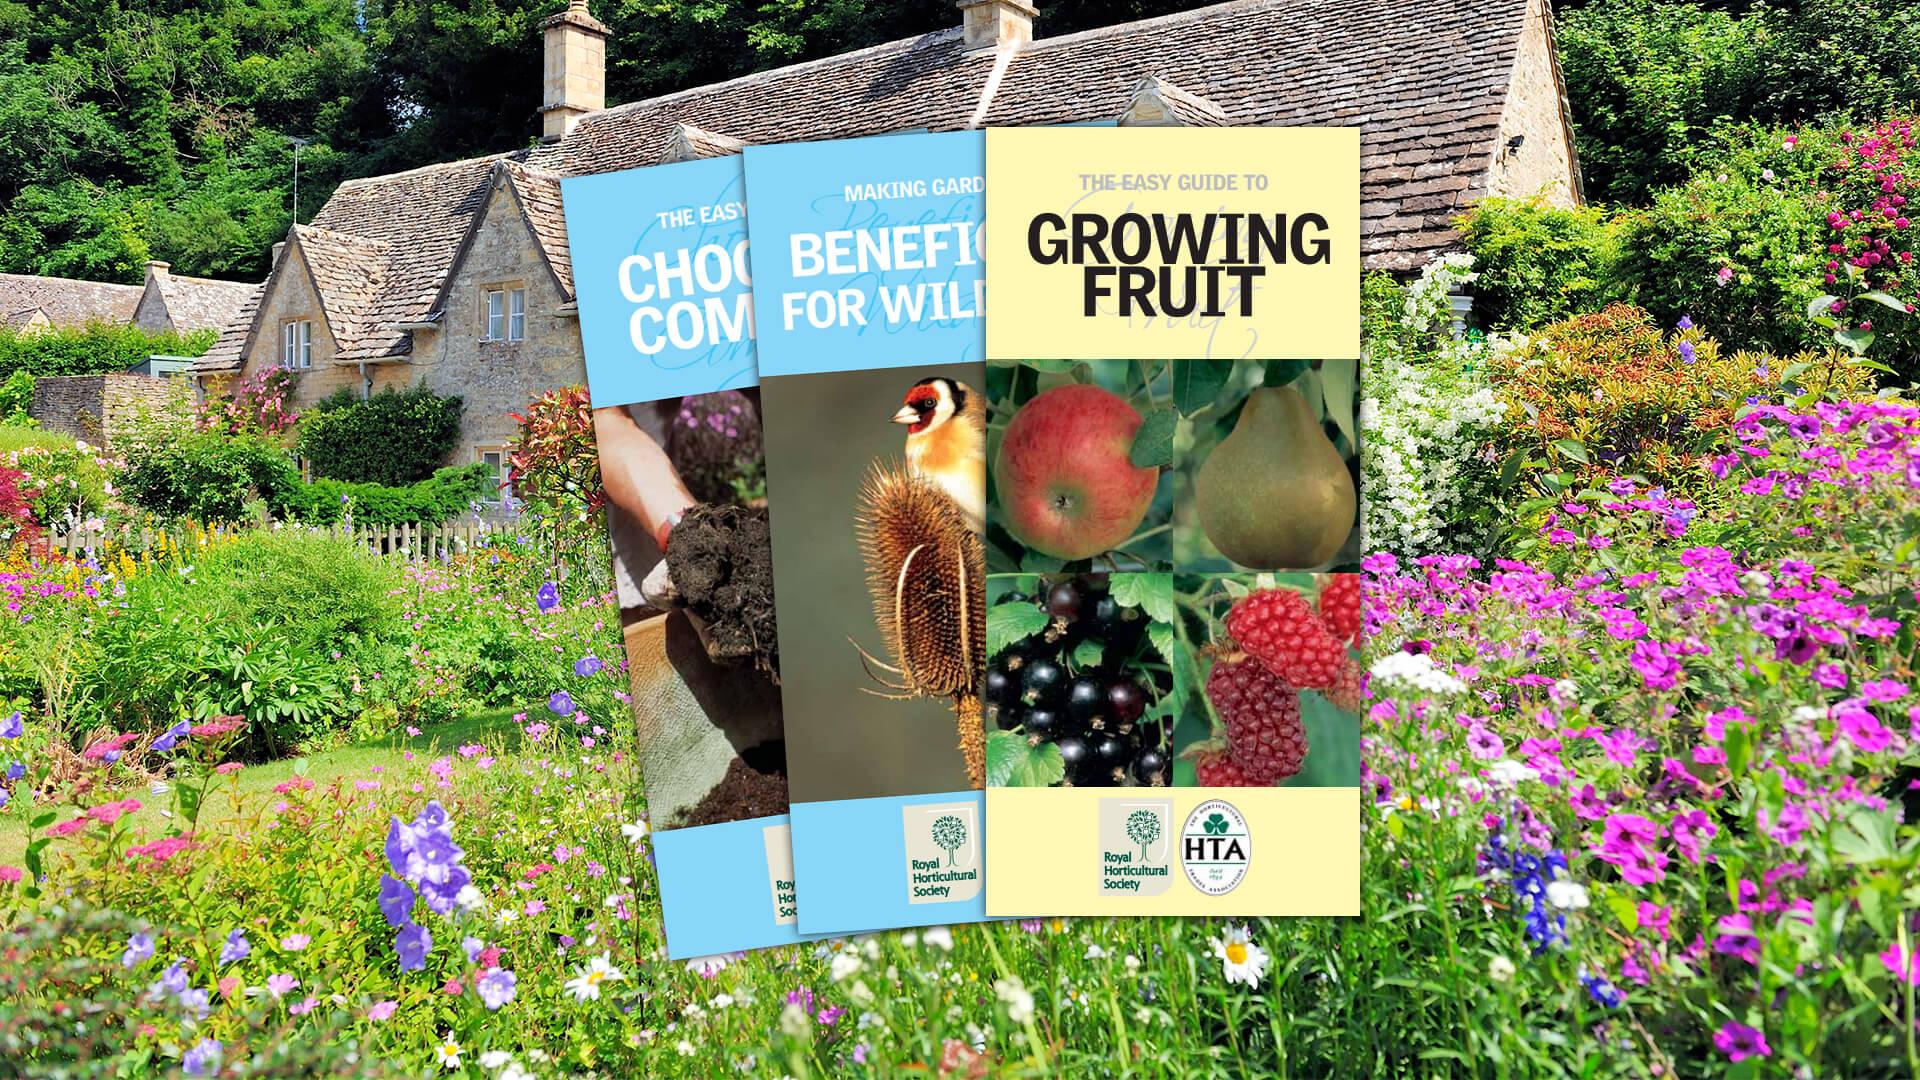 HTA RHS Gardening Guides